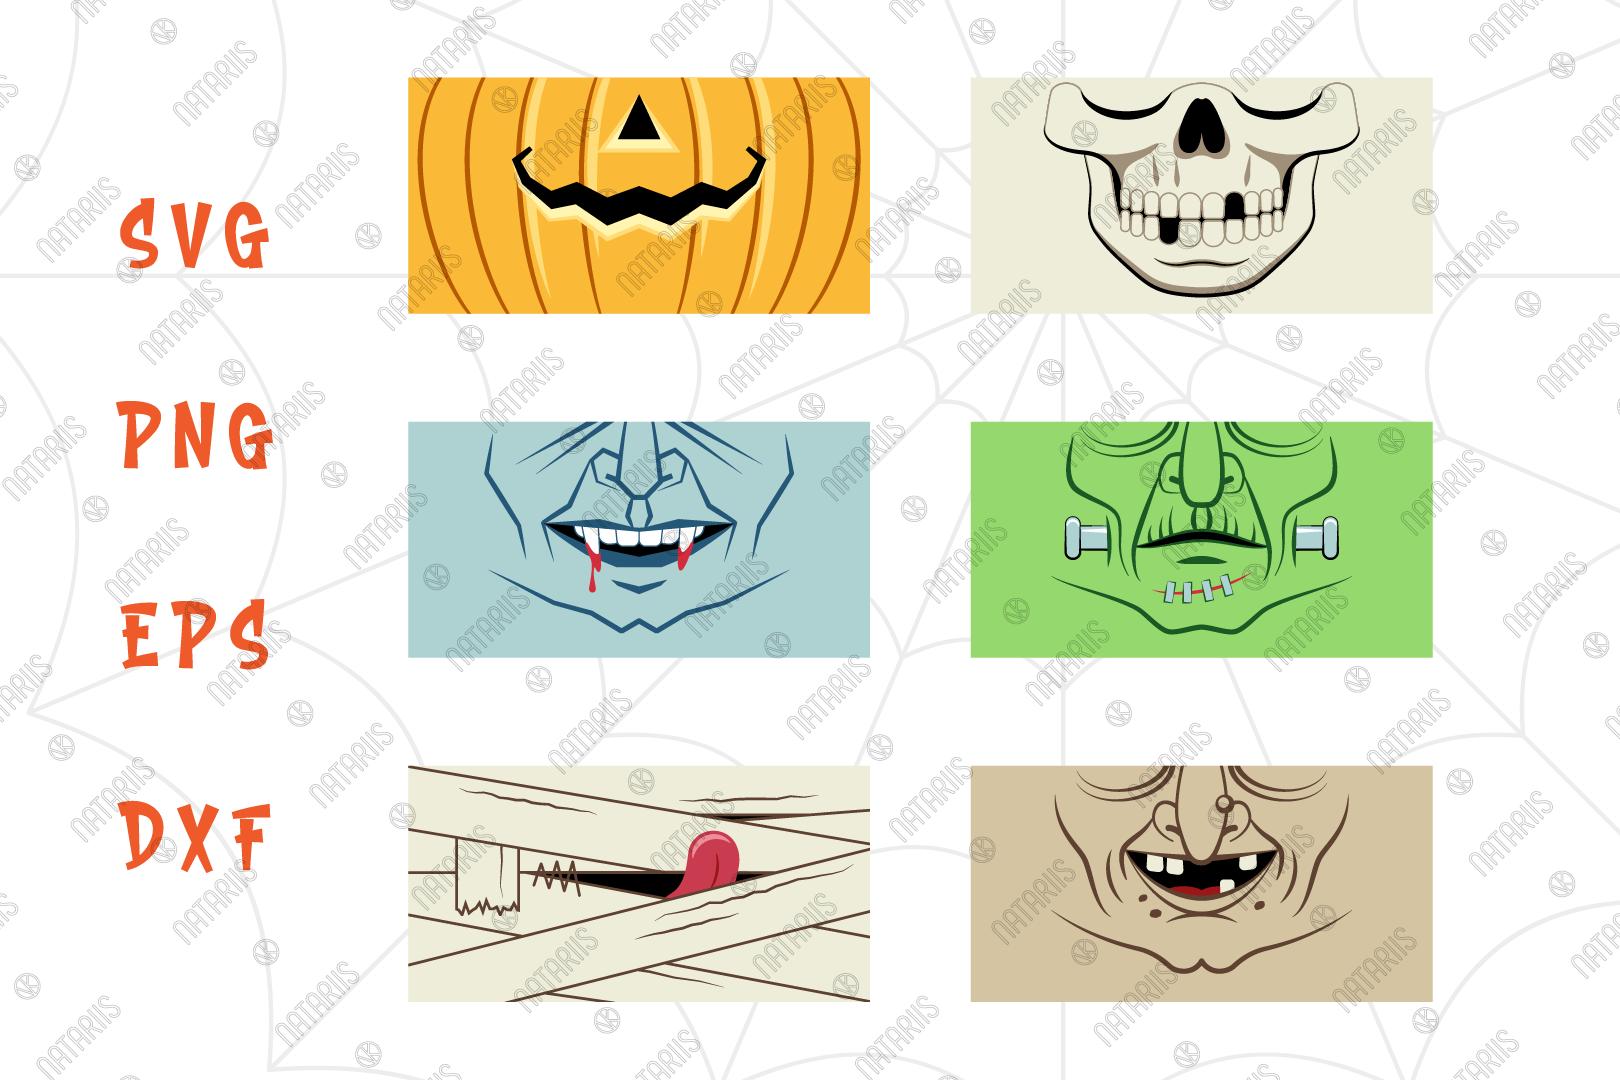 Svg Bundle 6 Funny Halloween Designs For Face Mask By Natariis Studio Thehungryjpeg Com